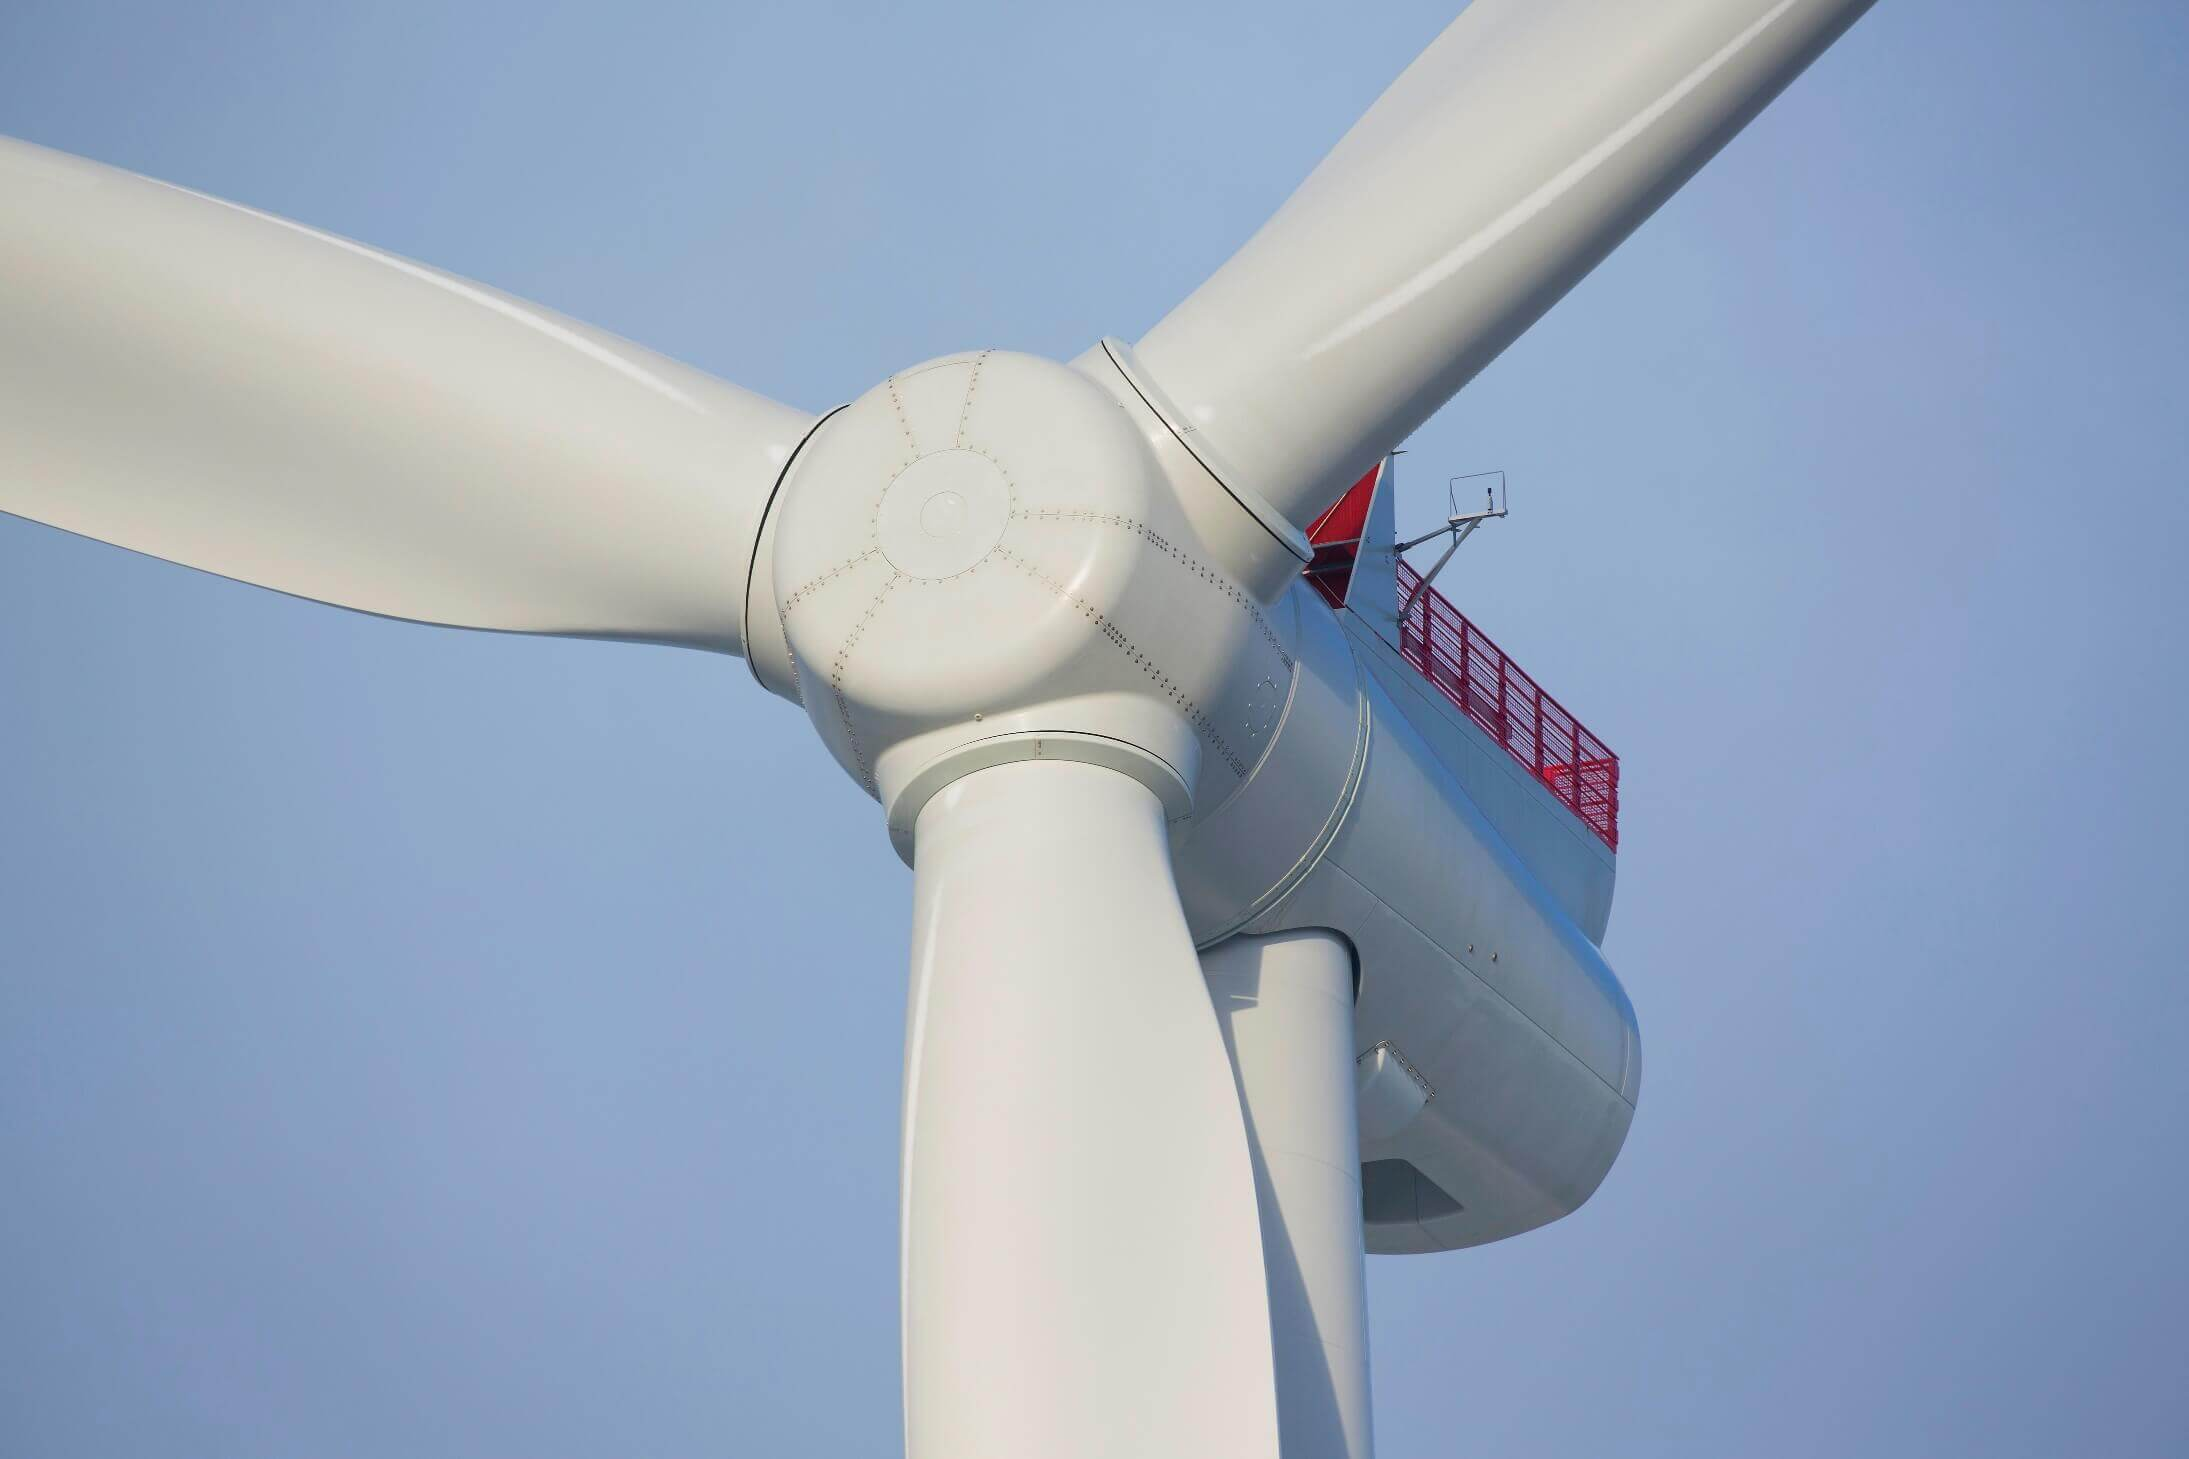 siemens-gamesa Siemens Gamesa Wins 752 MW Deal With DONG Energy